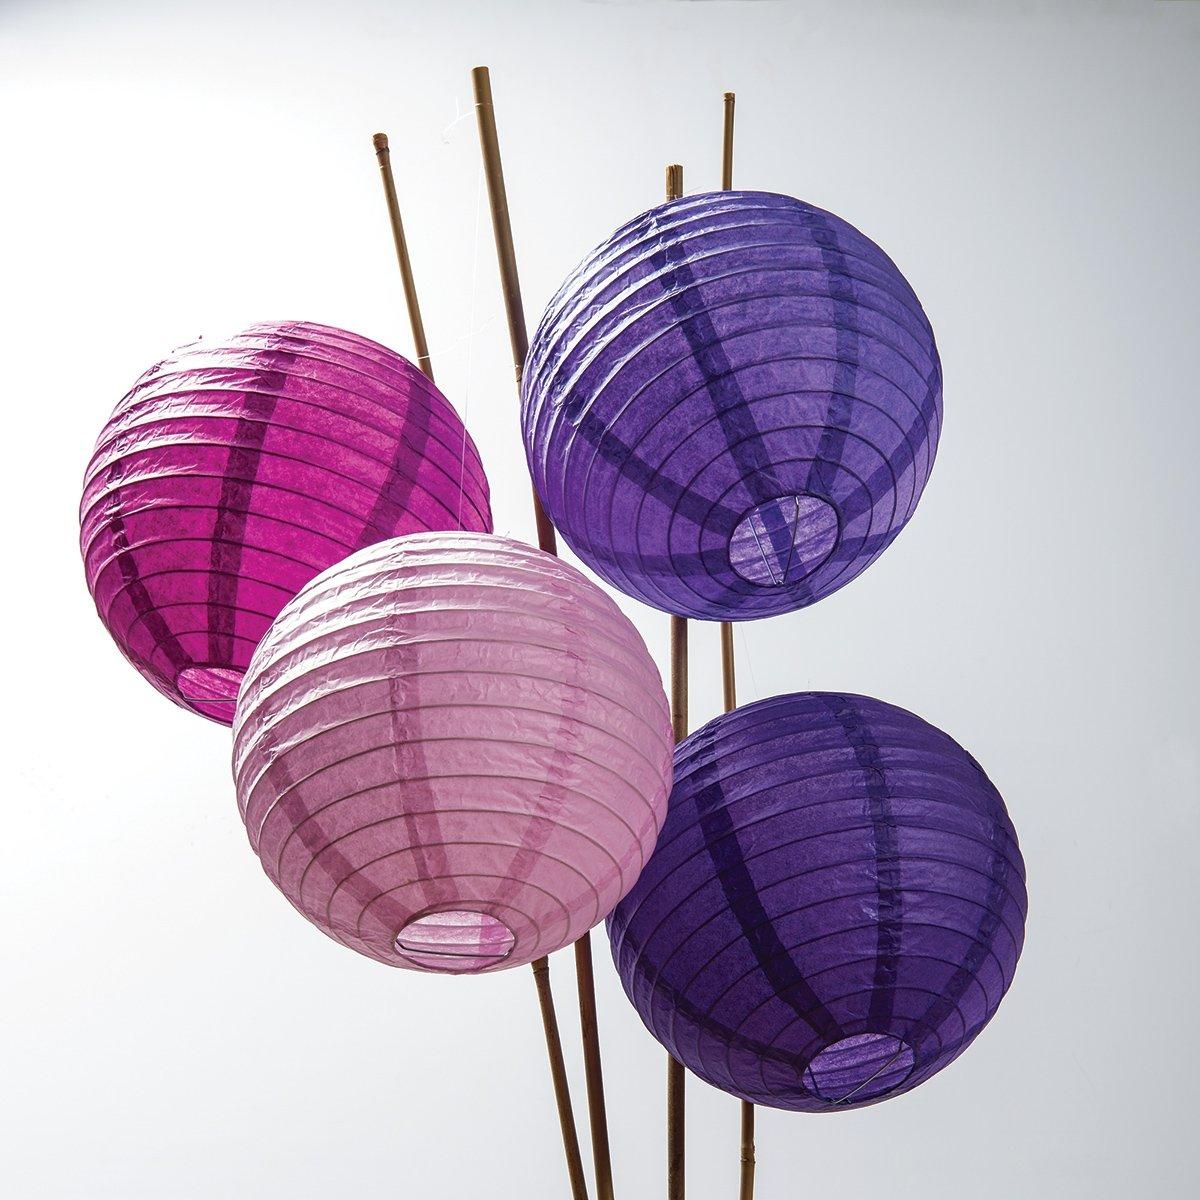 Luna Bazaar 8 Inch Paper Lanterns Multi colored